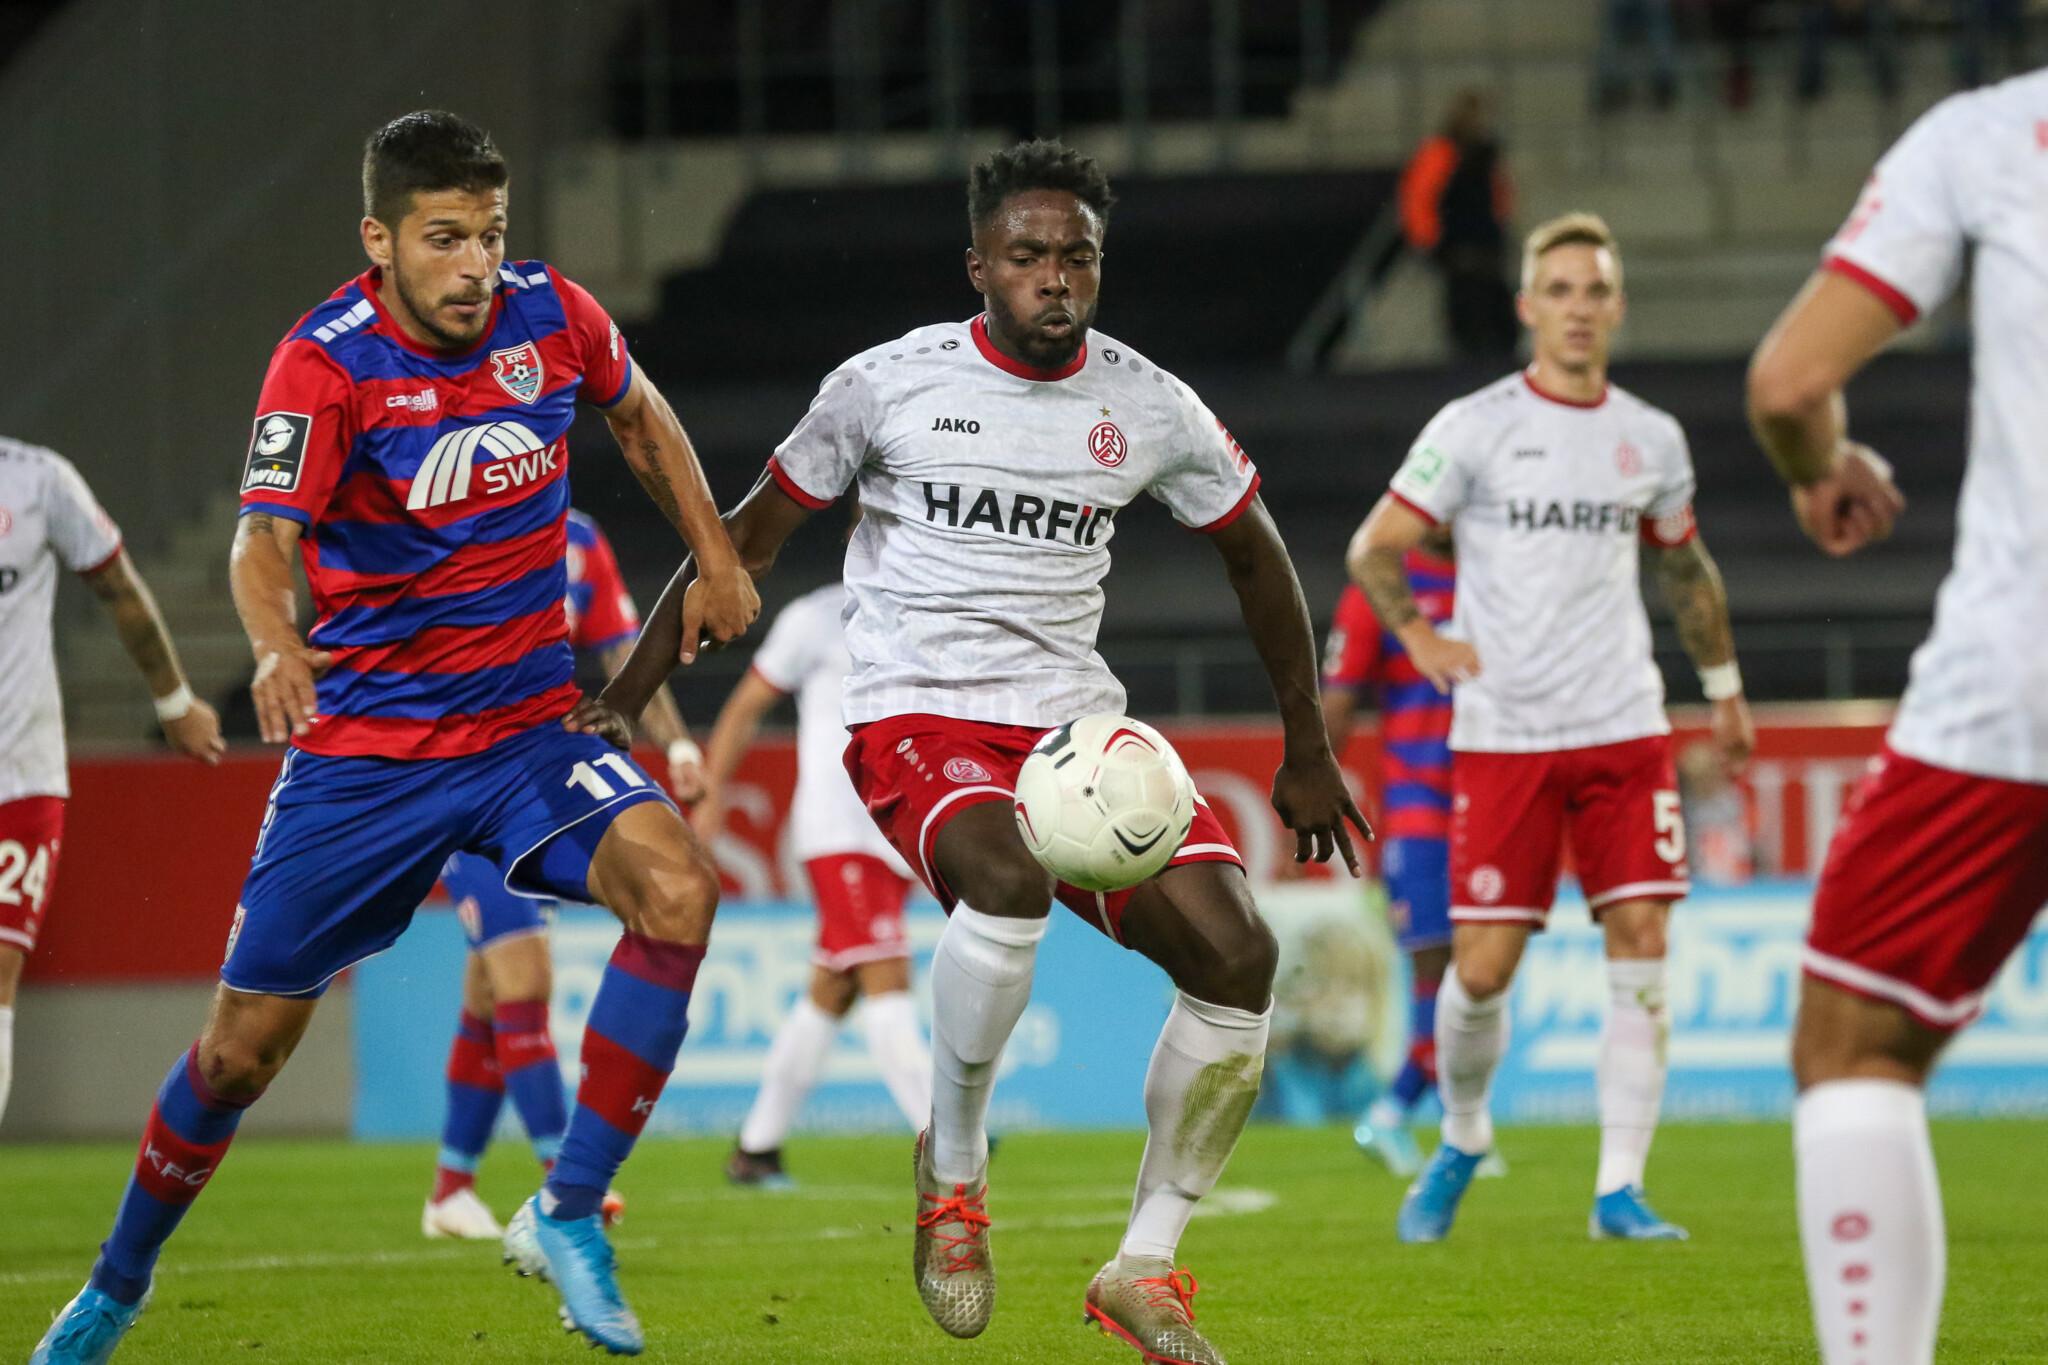 Ex-KFC-Uerdingen-Spieler Ricardo Rodriguez kämpft gegen RWE-Verteidiger Daniel Heber um den Ball.